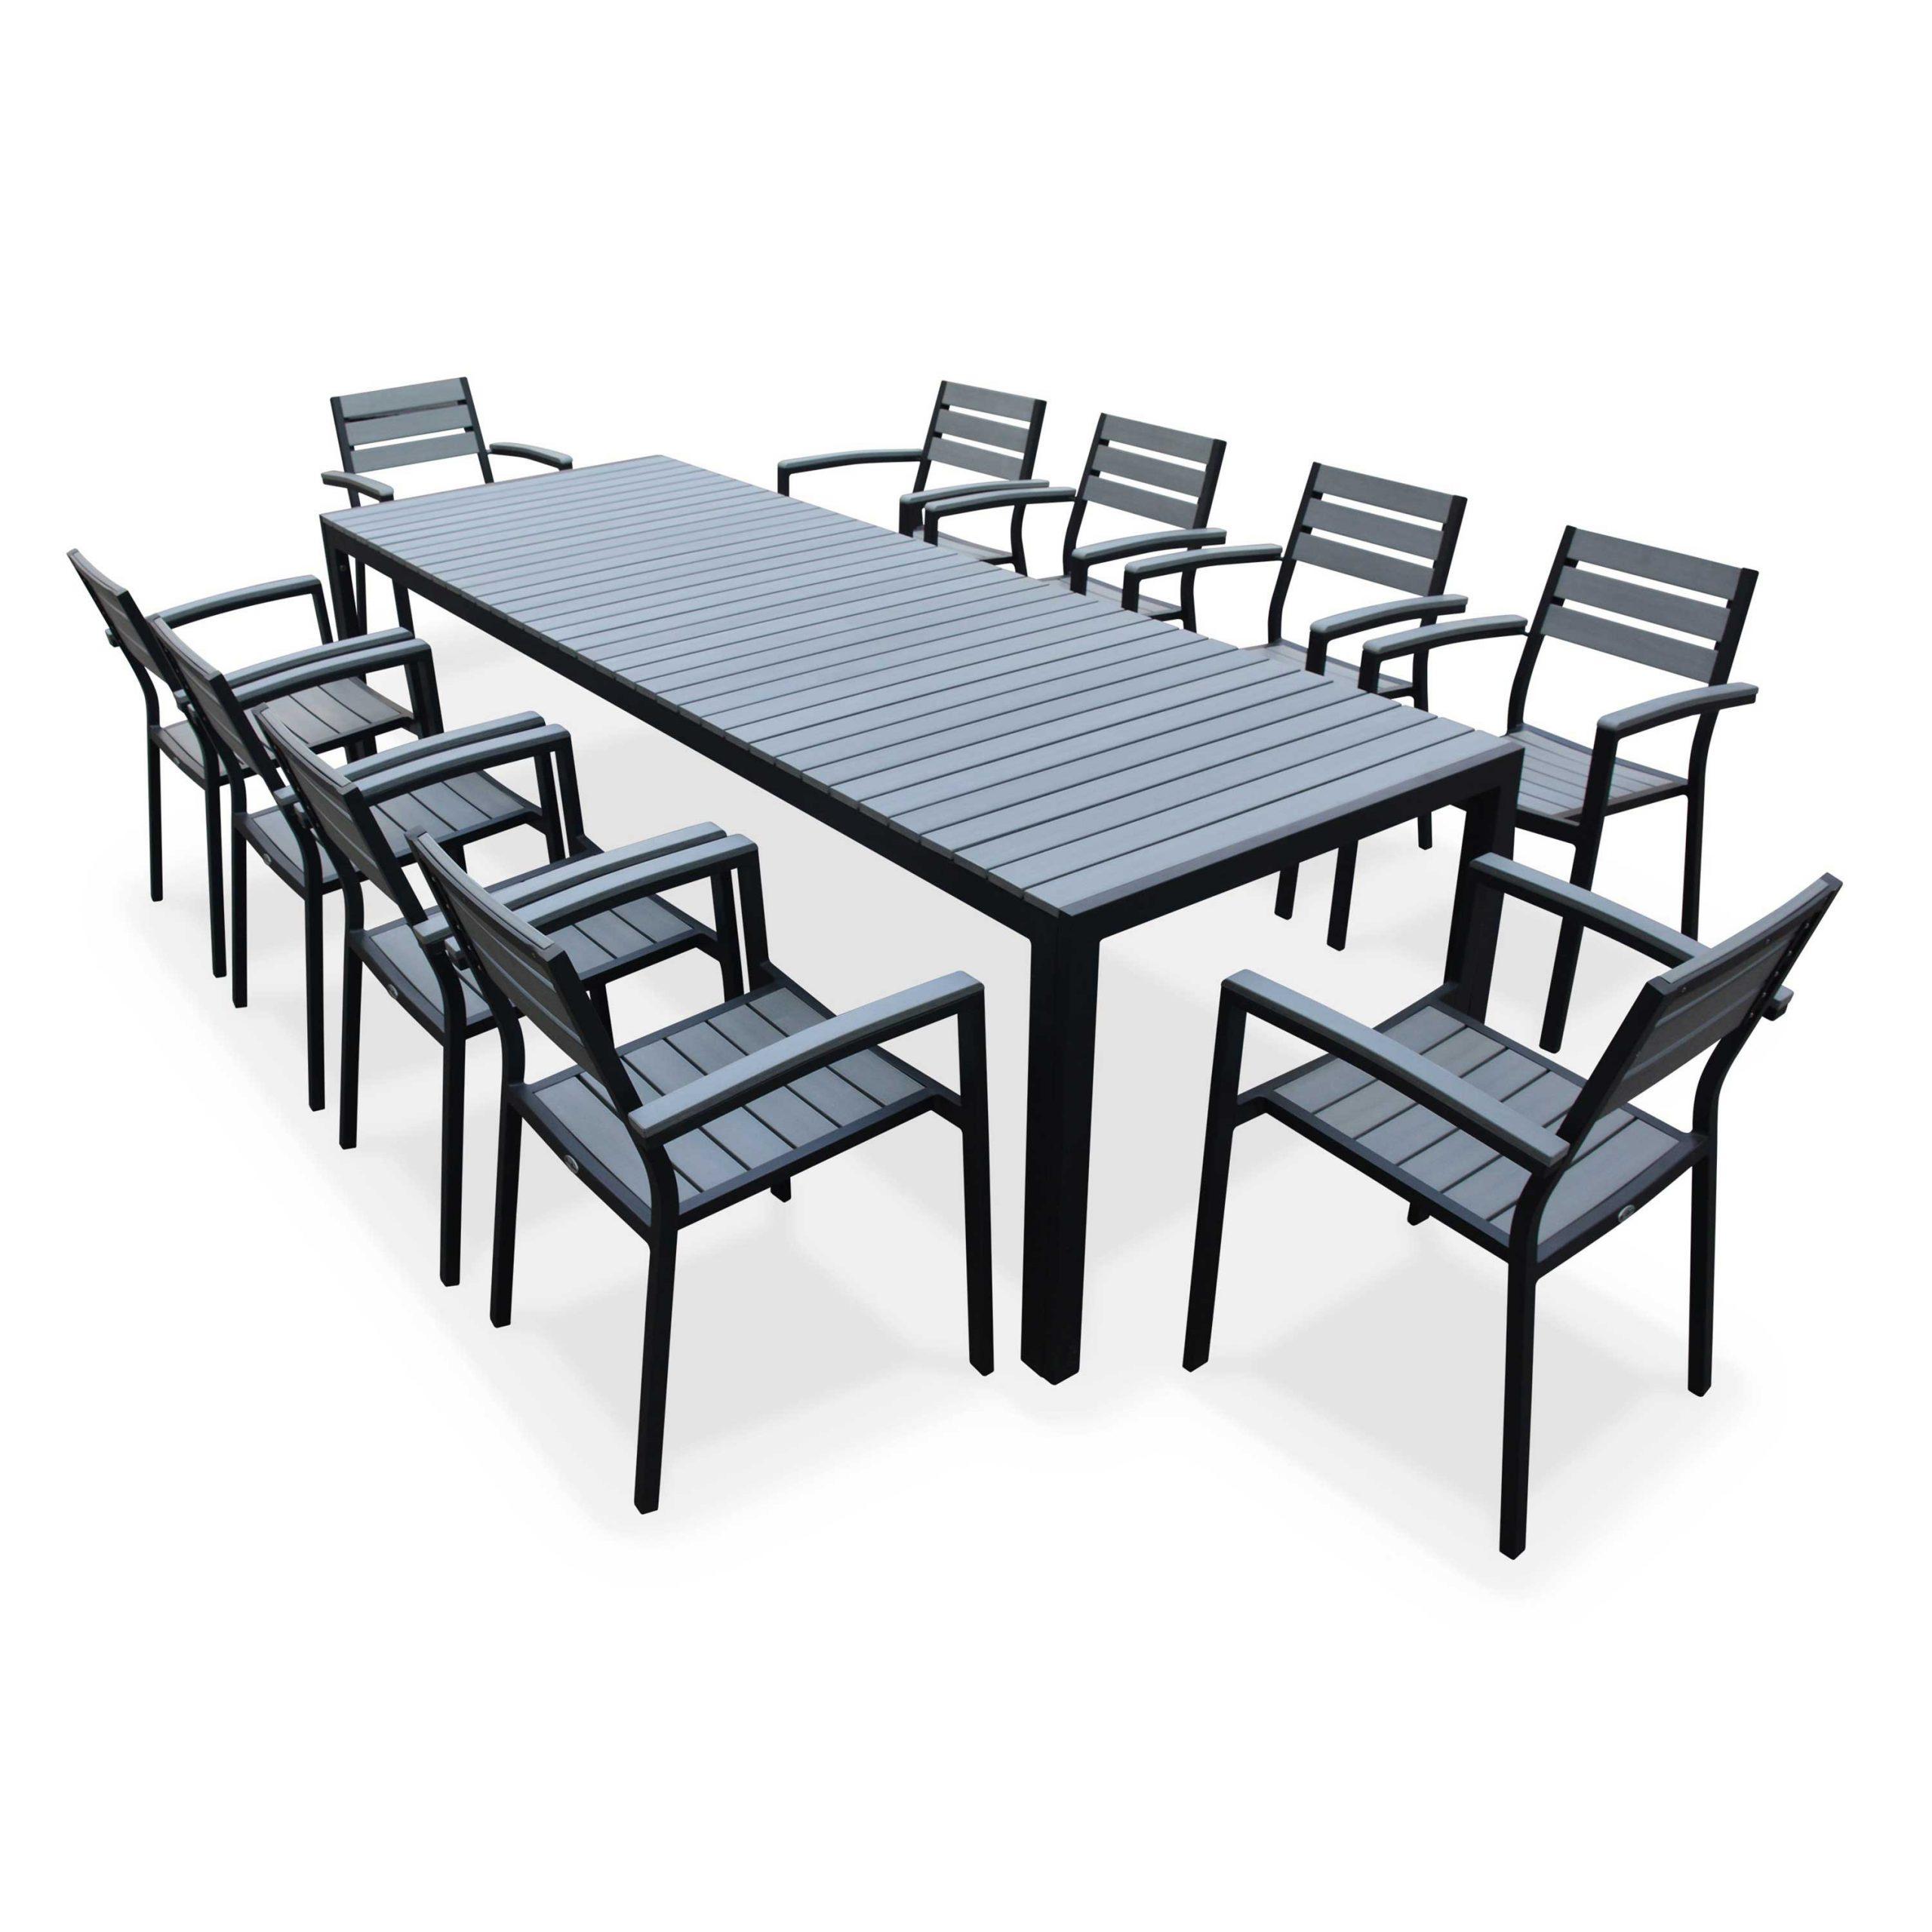 Table De 10 Jardin Personnes Castorama Rocqdxewb à Table De Jardin Pliante Castorama